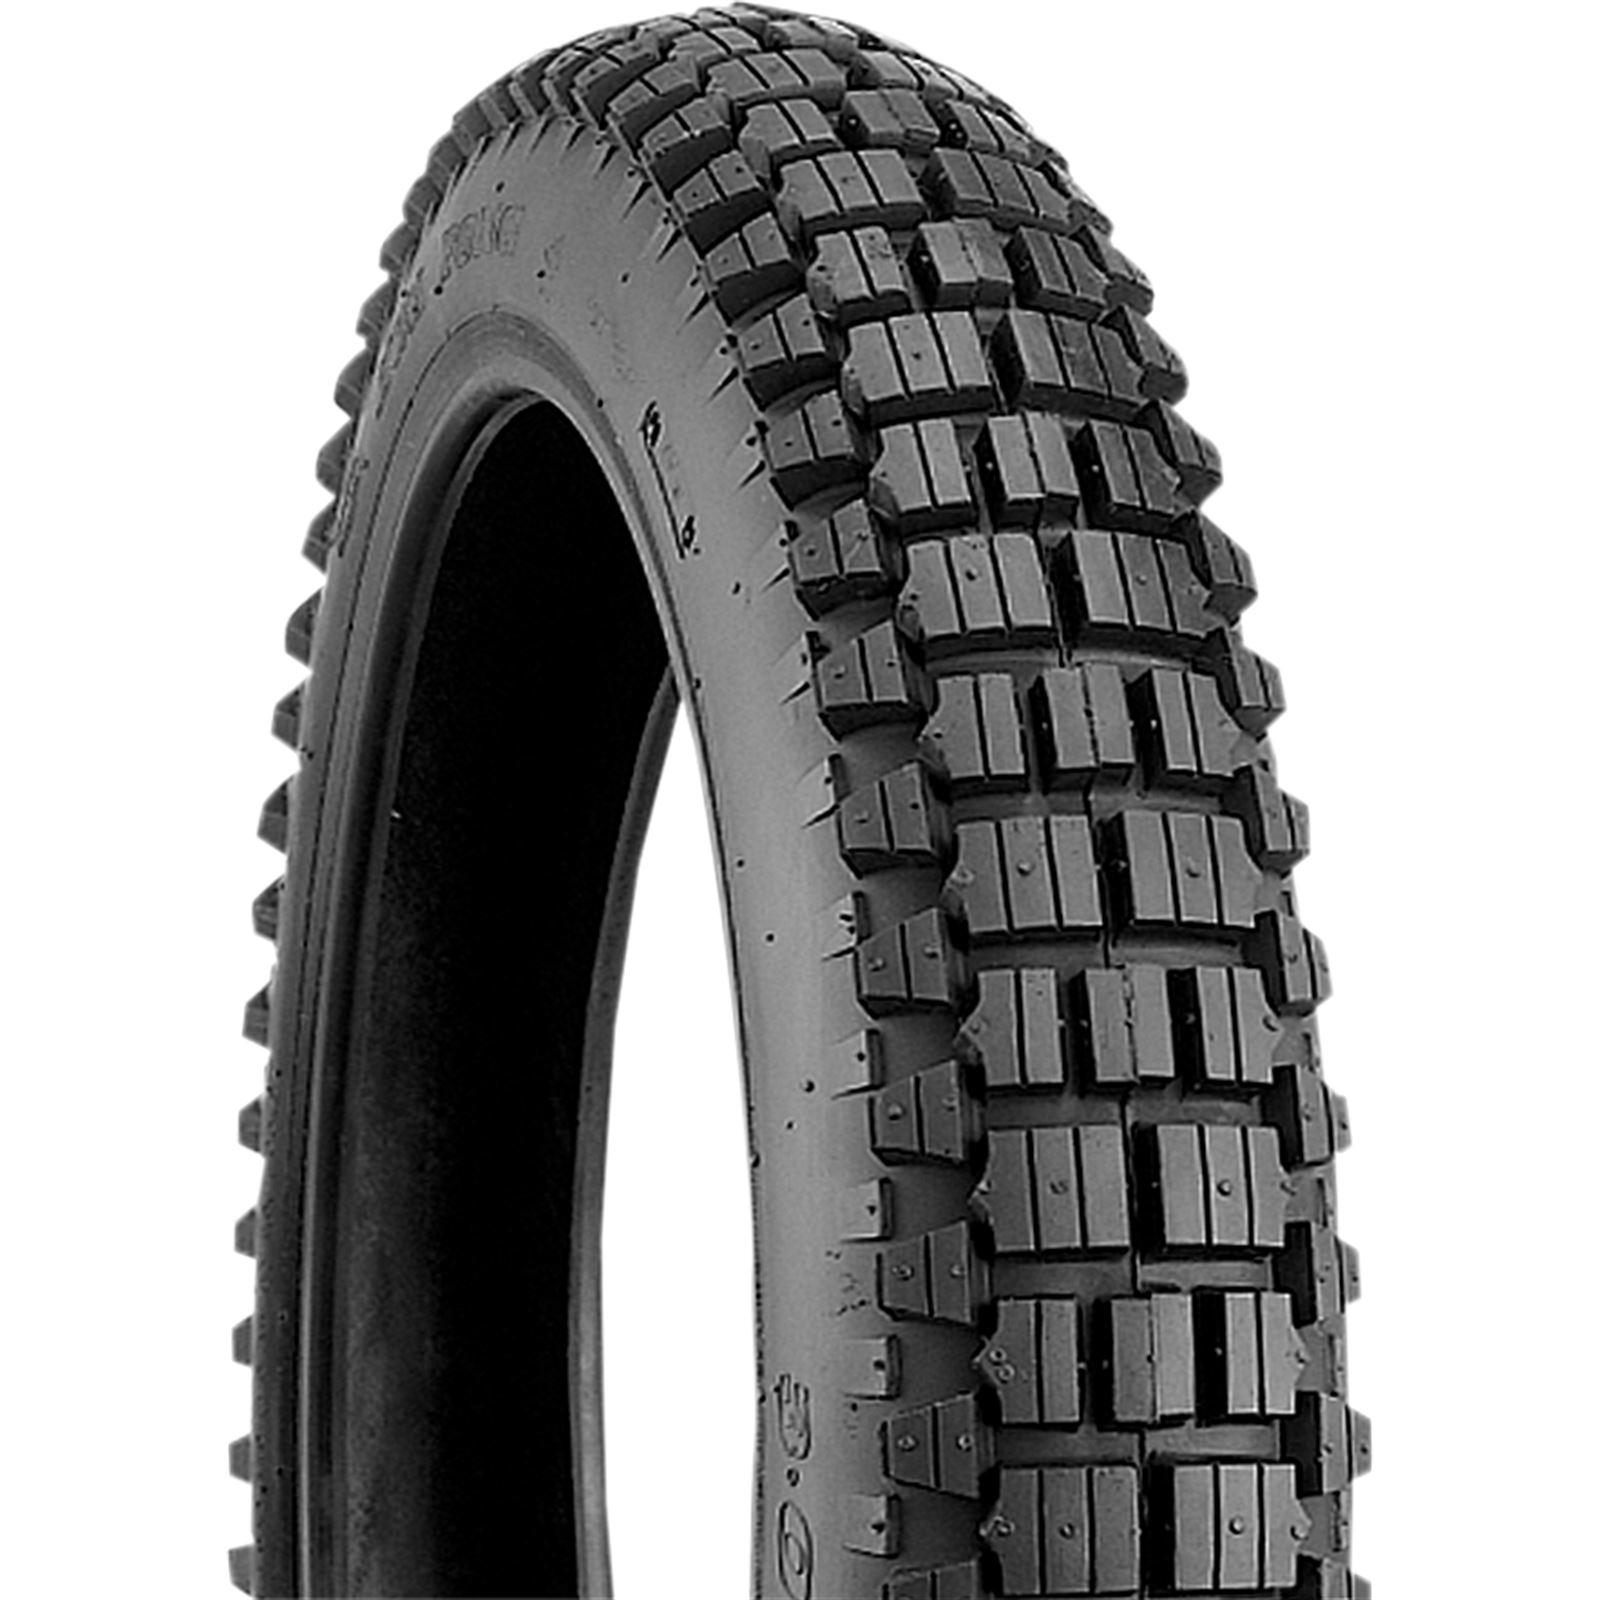 Duro Tire Tire - HF307 - 400-18 4PR - Tube Type